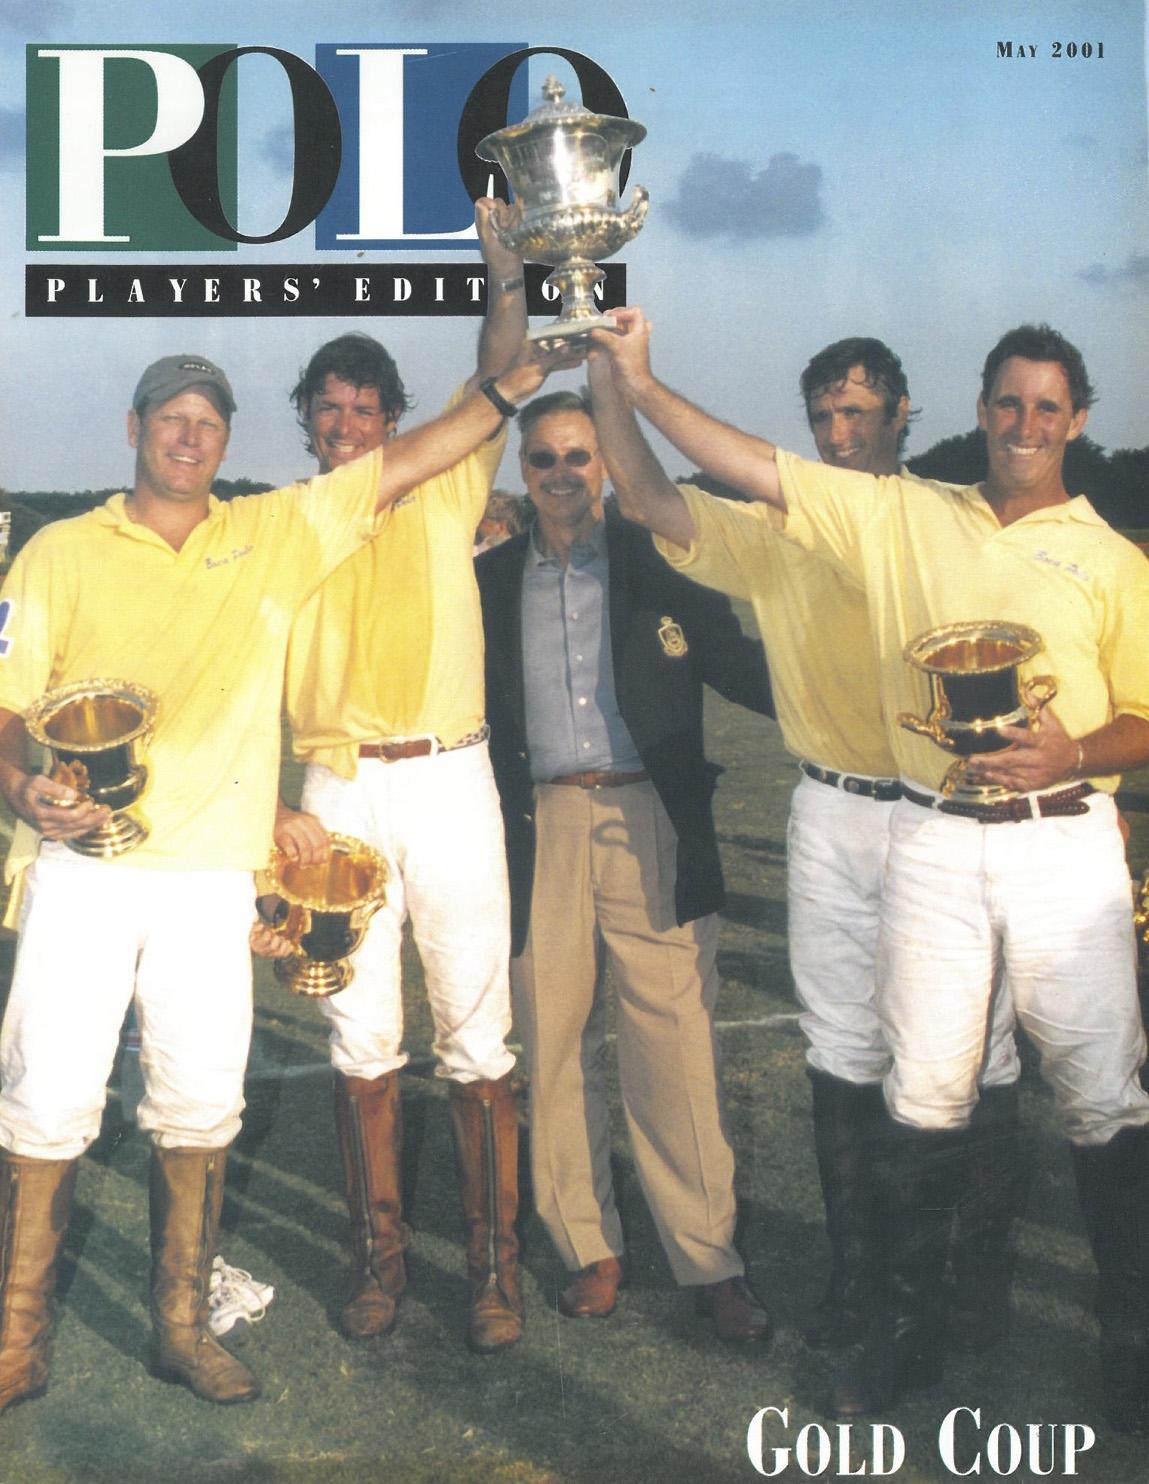 Joey Casey, Juan Bollini, Juan Badiola, Charlie Muldoon and David Cummings presenting USPA Gold Cup trophy to the winners